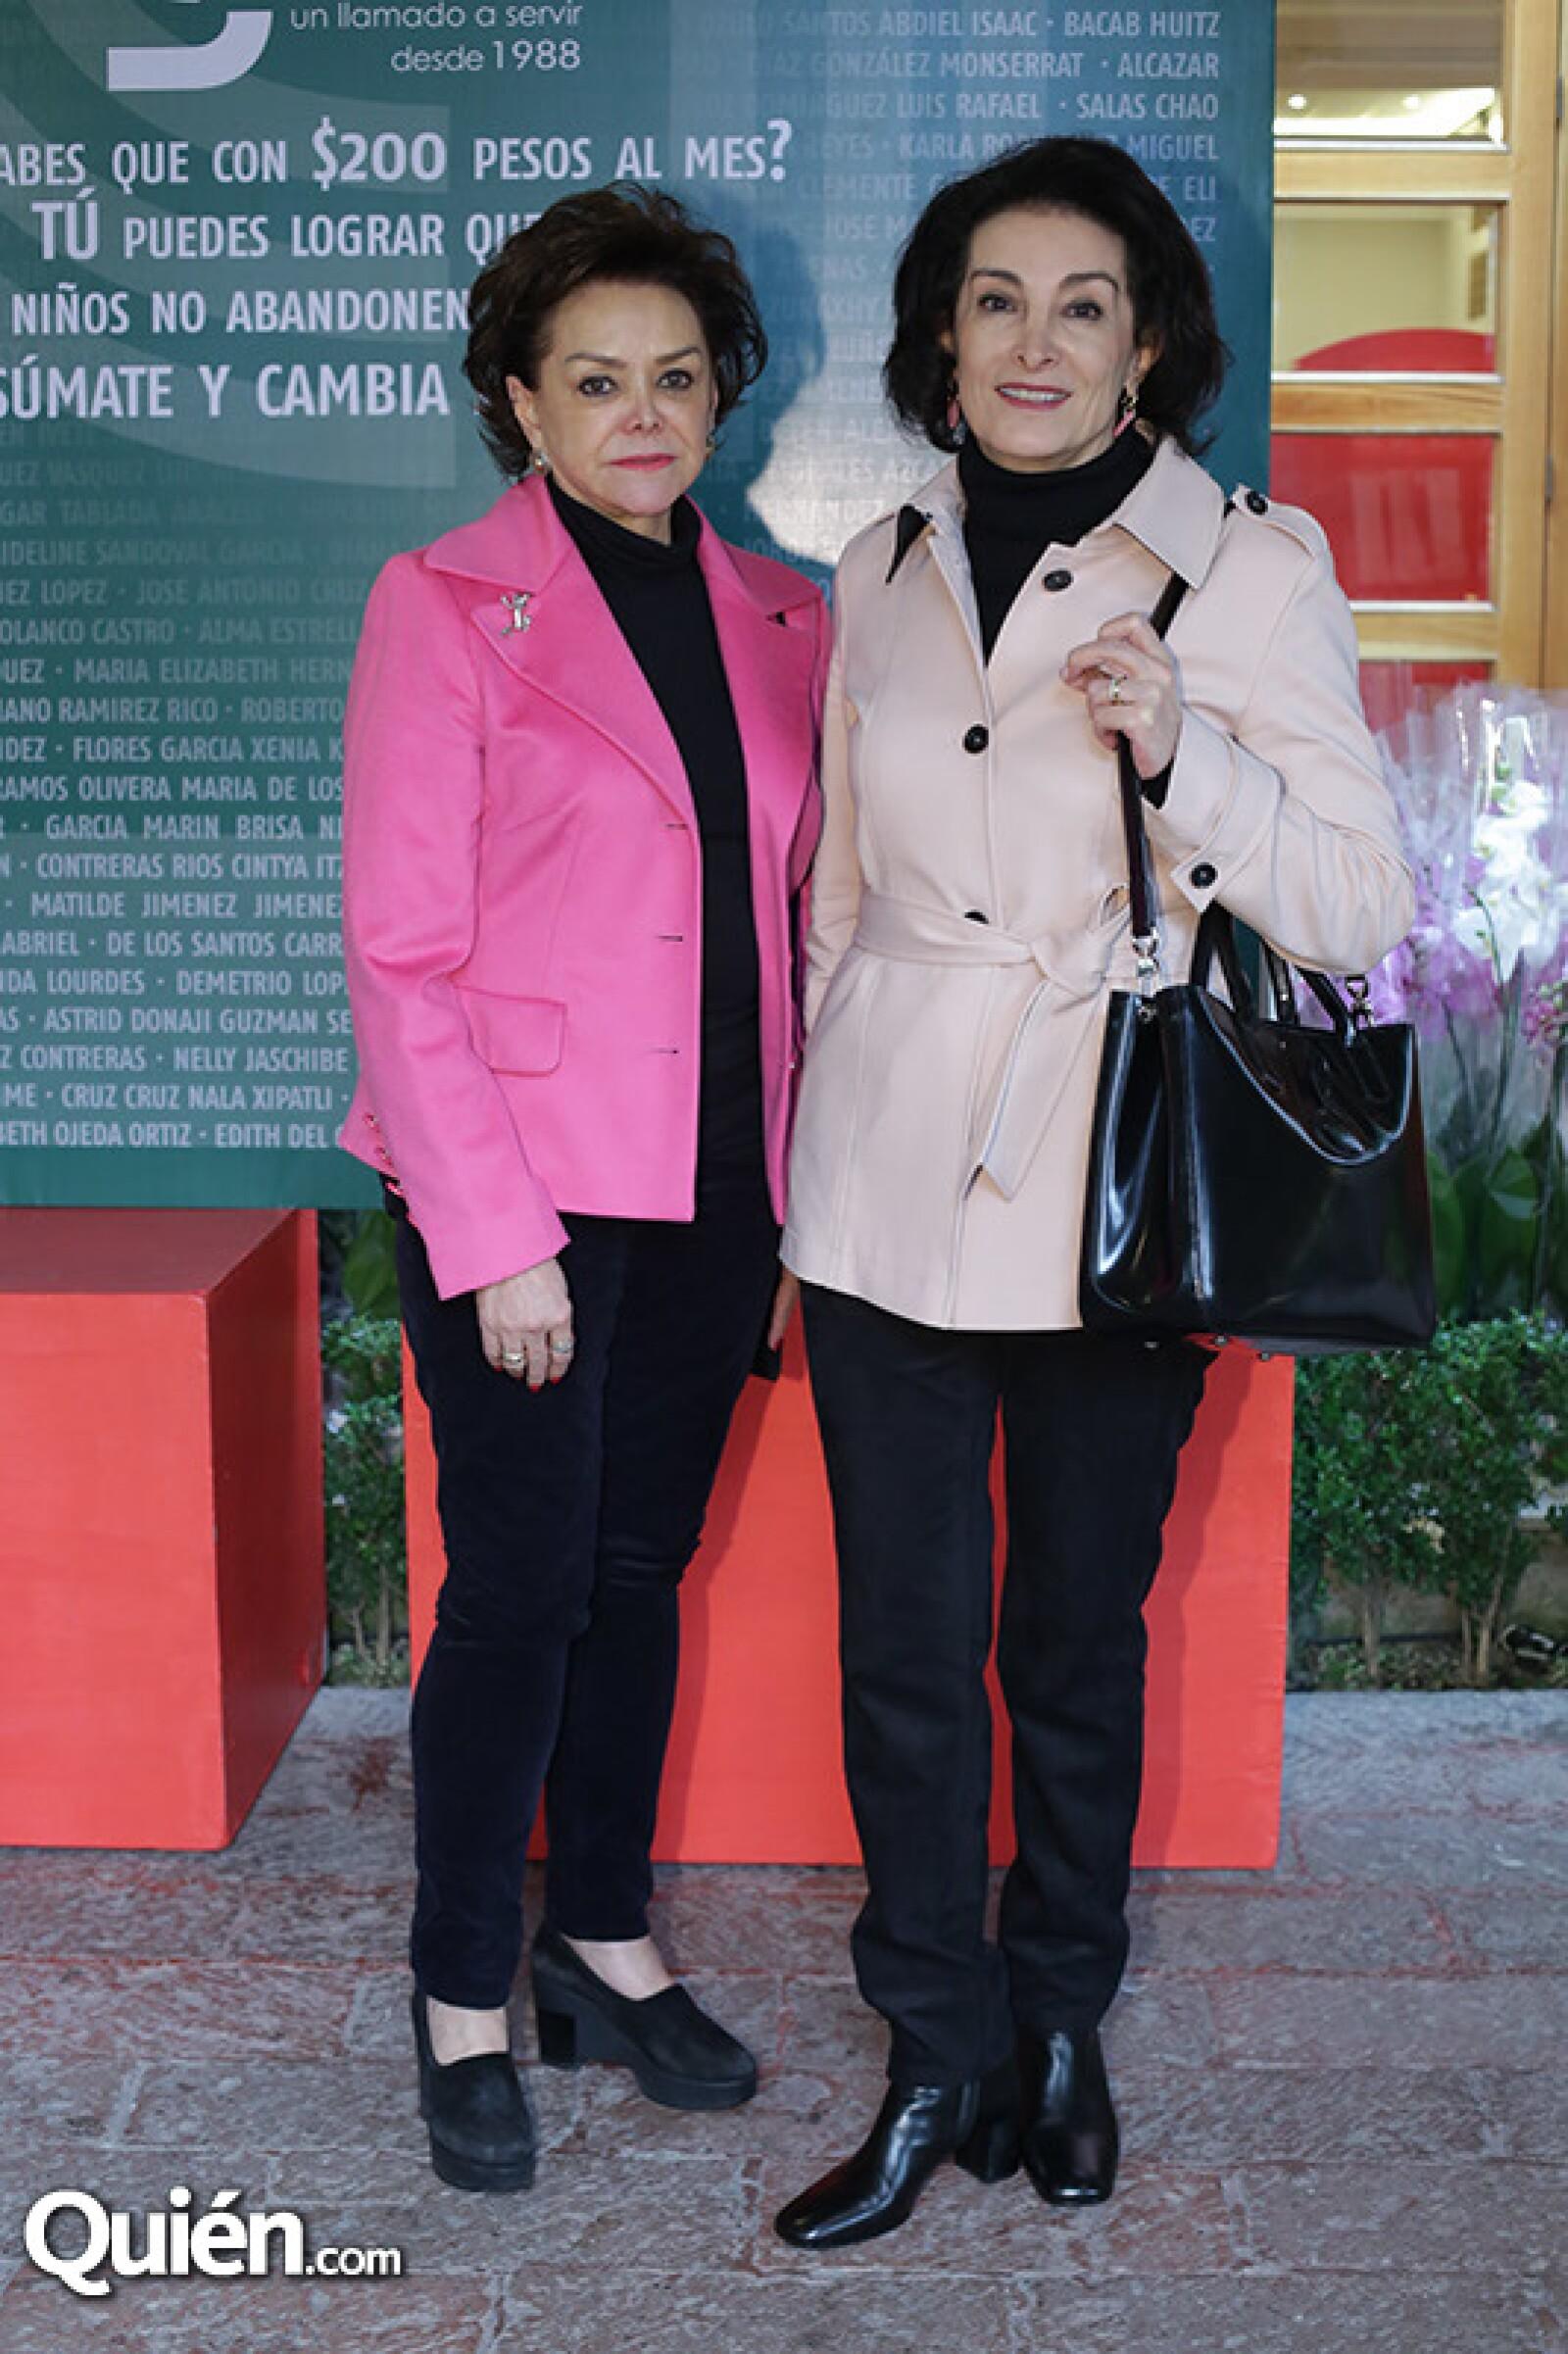 Adriana Salinas y Laila Aboumrad